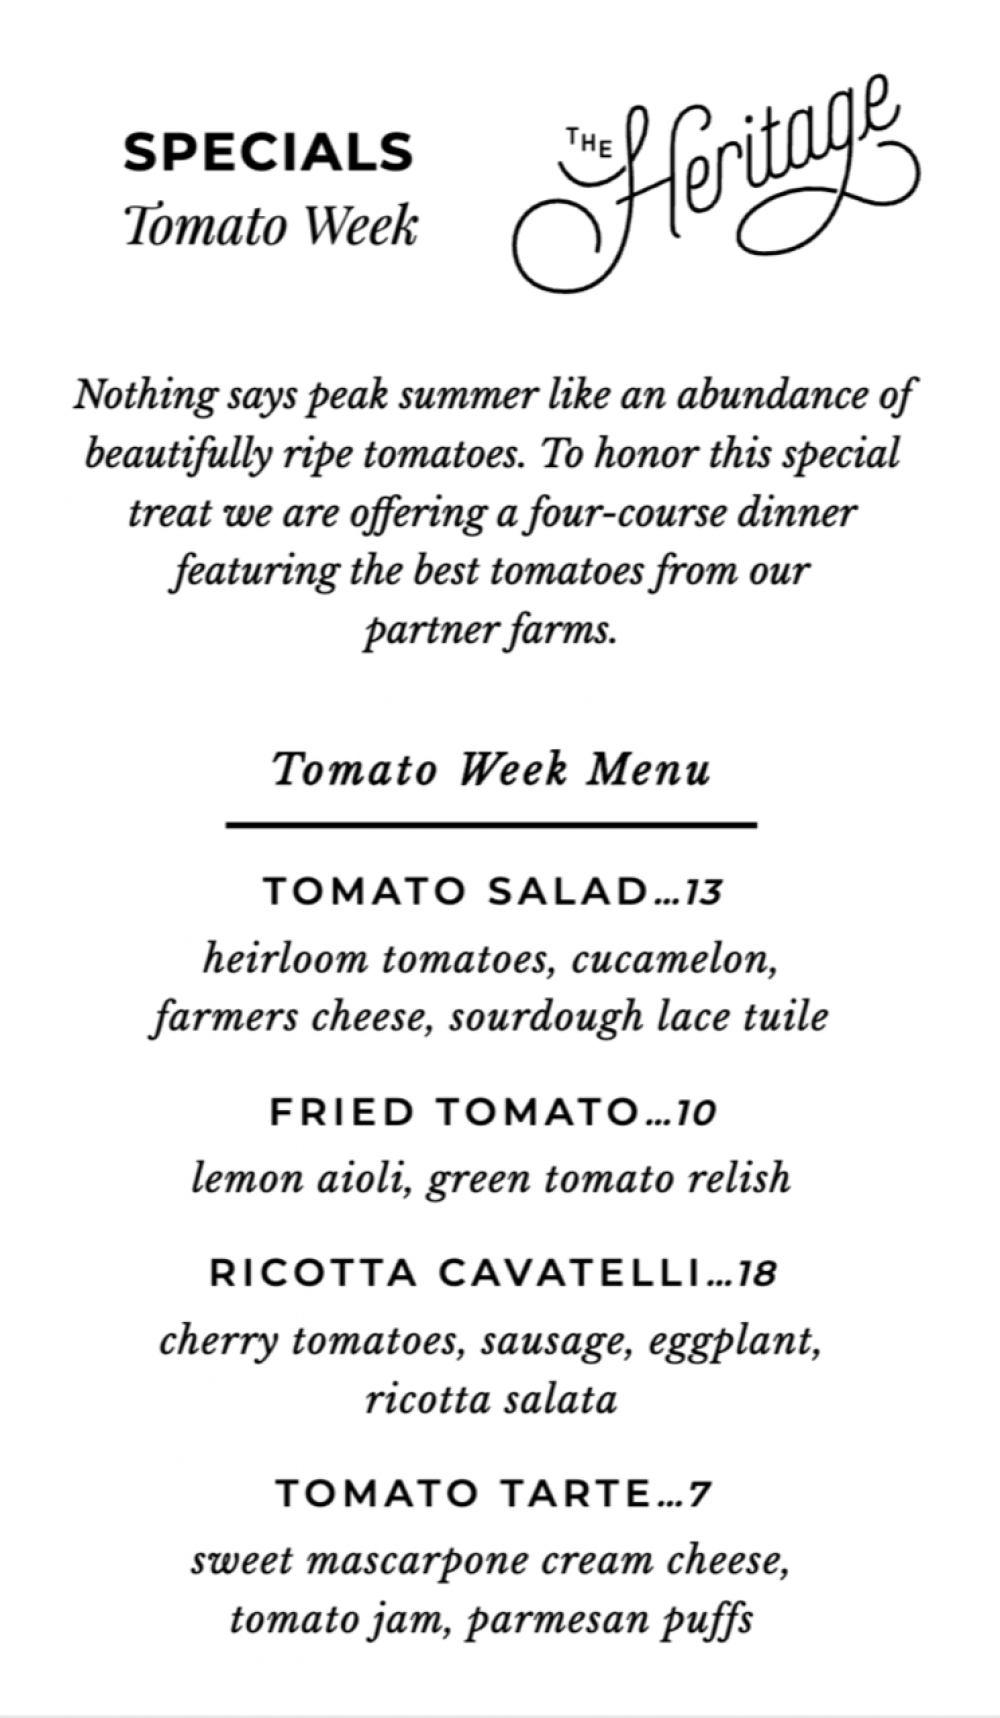 The Heritage Tomato Week